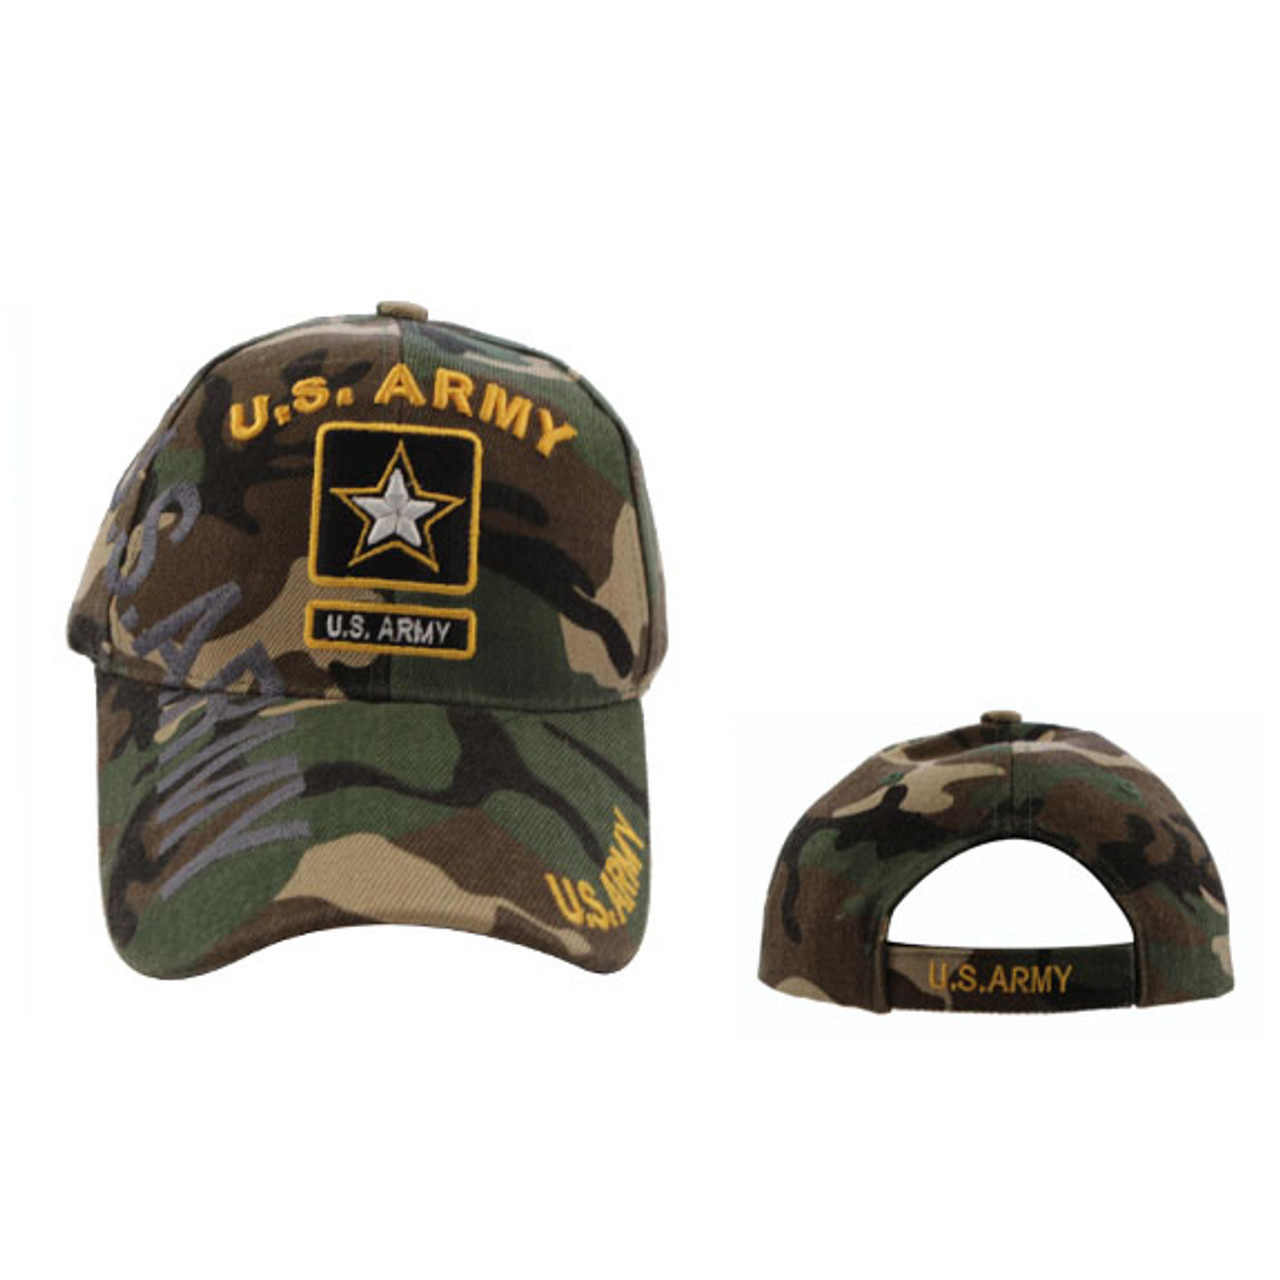 Wholesale Military Cap C1008 (1 pc.) U.S. Army